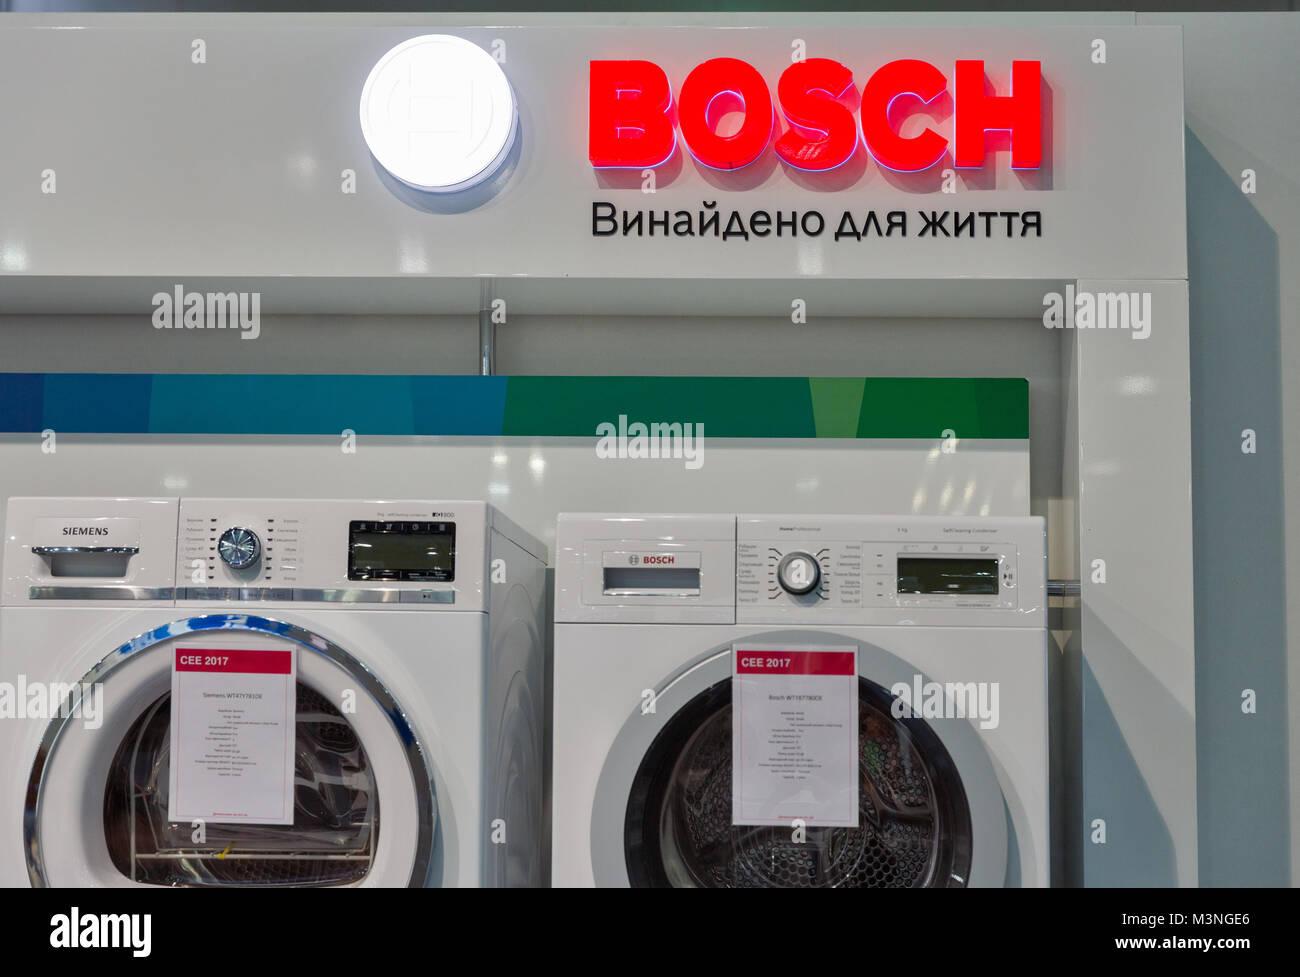 Bosch Siemens Stock Photos Bosch Siemens Stock Images Alamy